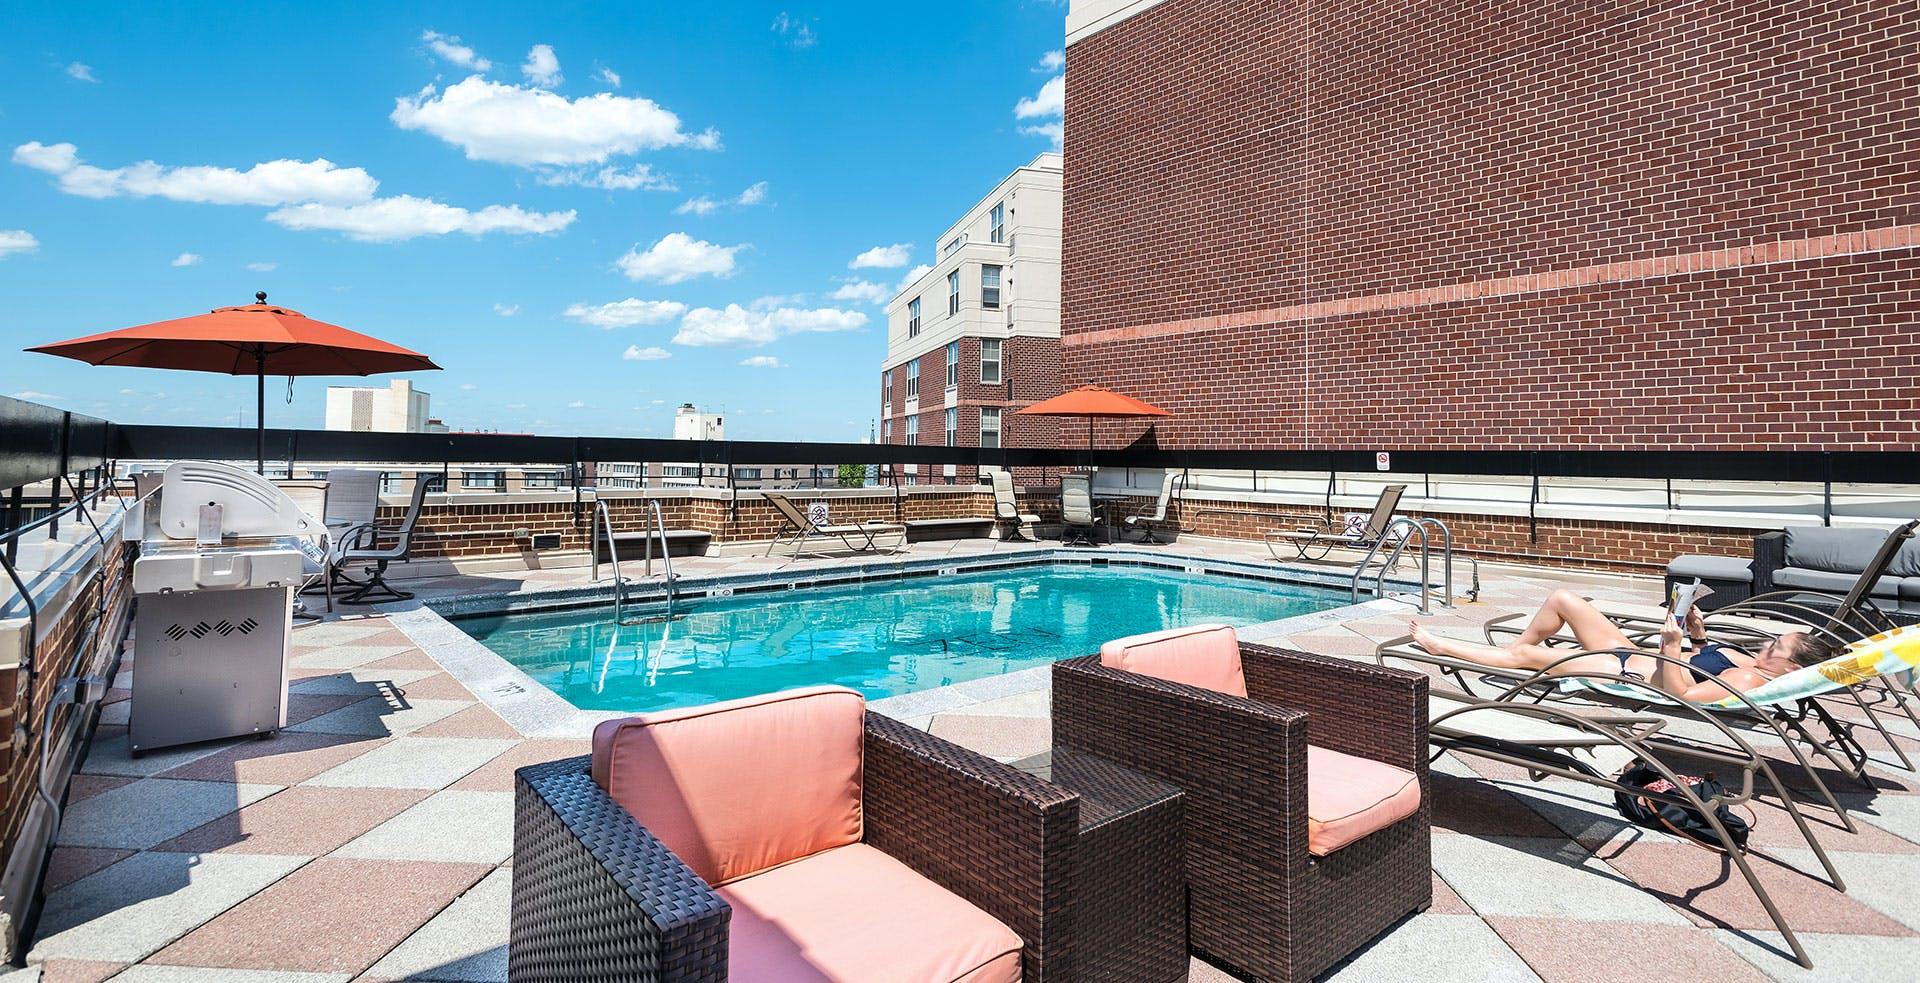 49 Residents | Massachusetts Ave. - Northwest Washington | Exclusive Modern Apt. - Incl. Gym + Rooftop Pool